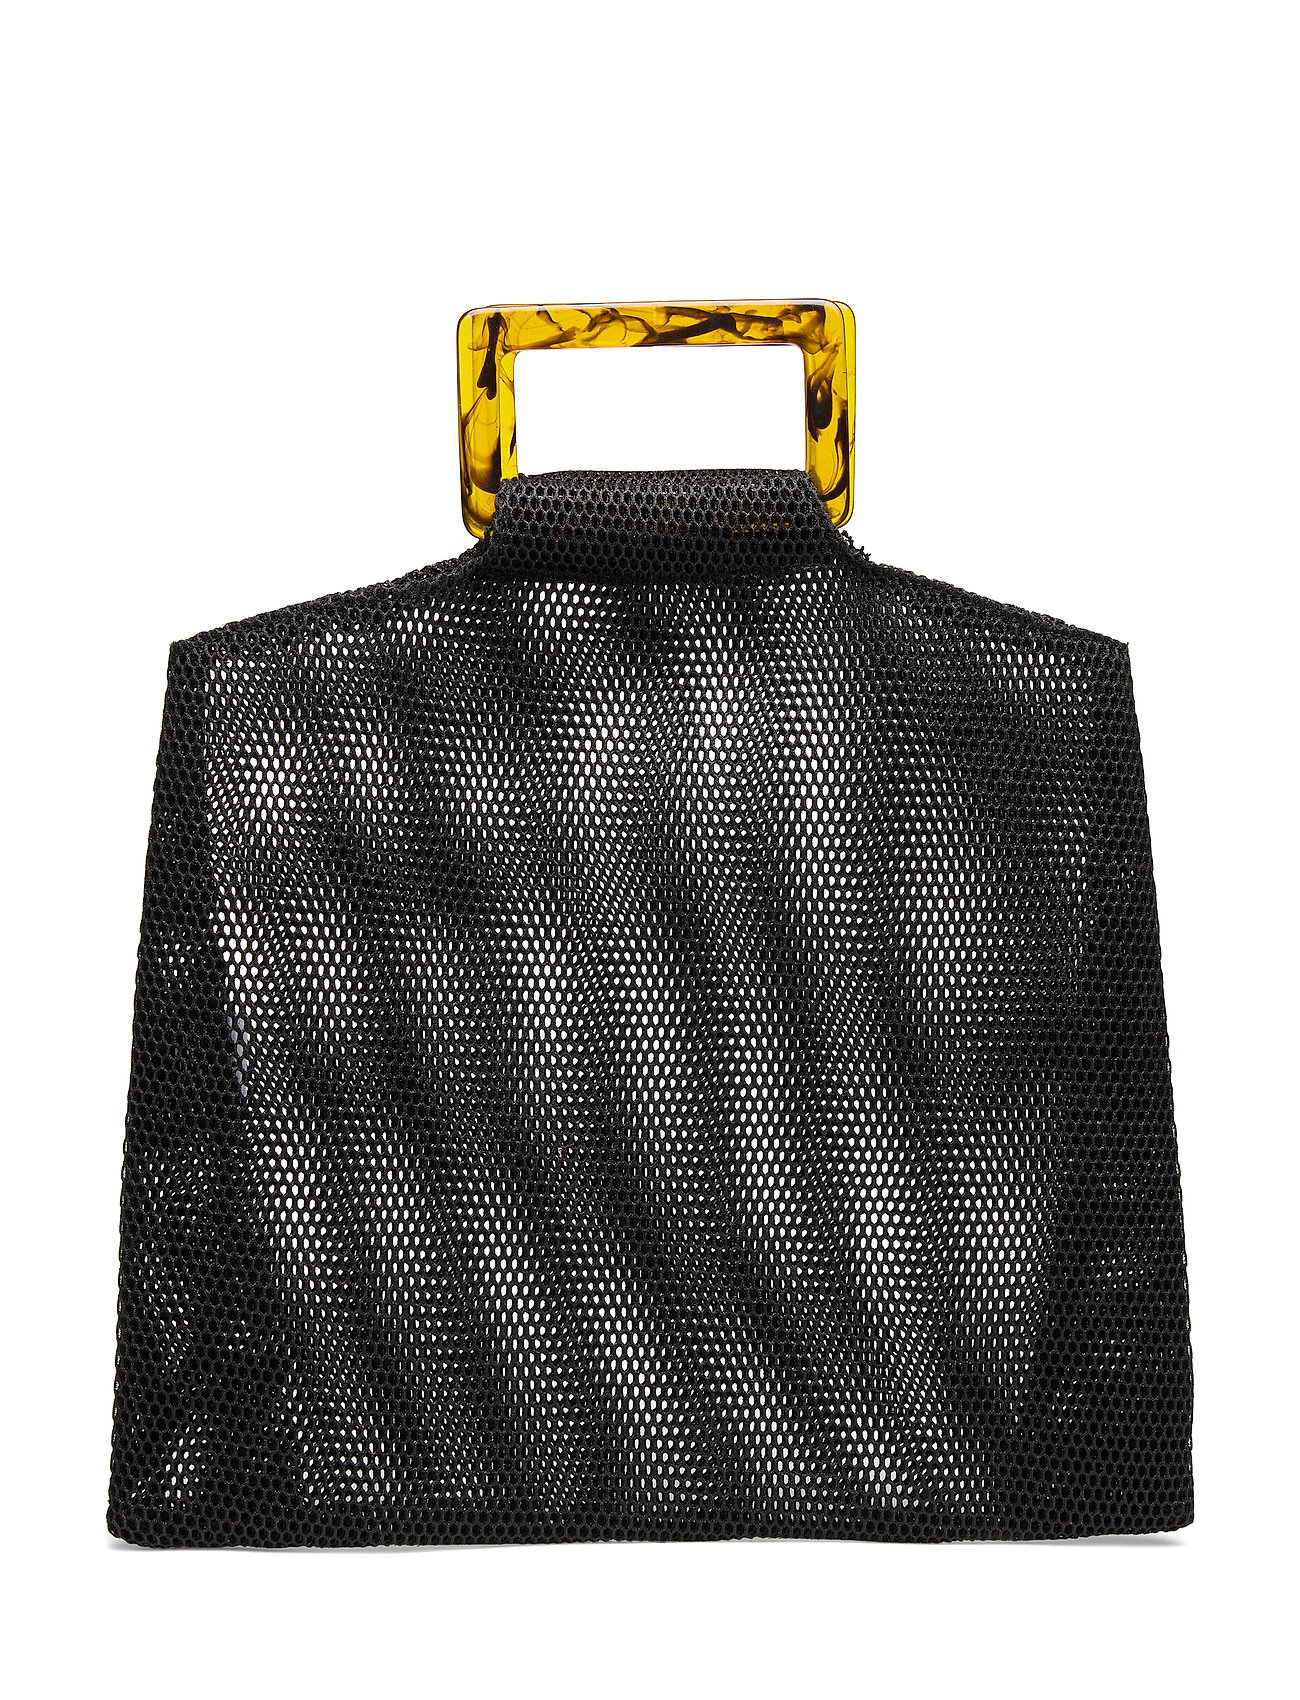 BECKSÖNDERGAARD Glimmer Bag - BLACK